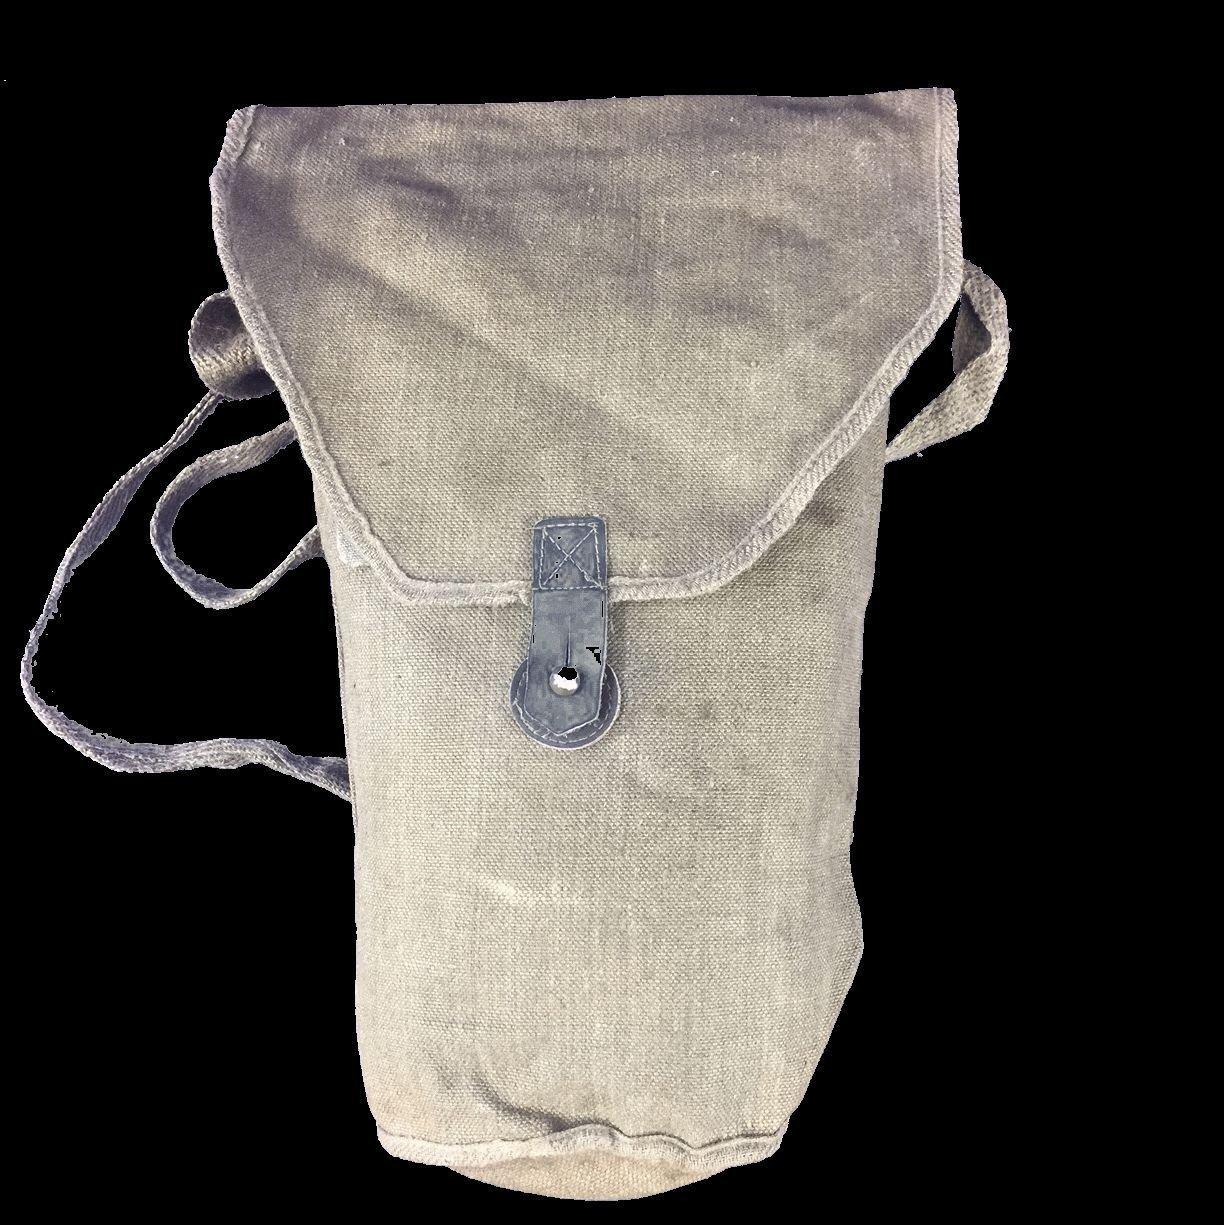 Italian Army Ww2 Ww11 Vintage Genuine T 35 Canvas Gas Mask Bag